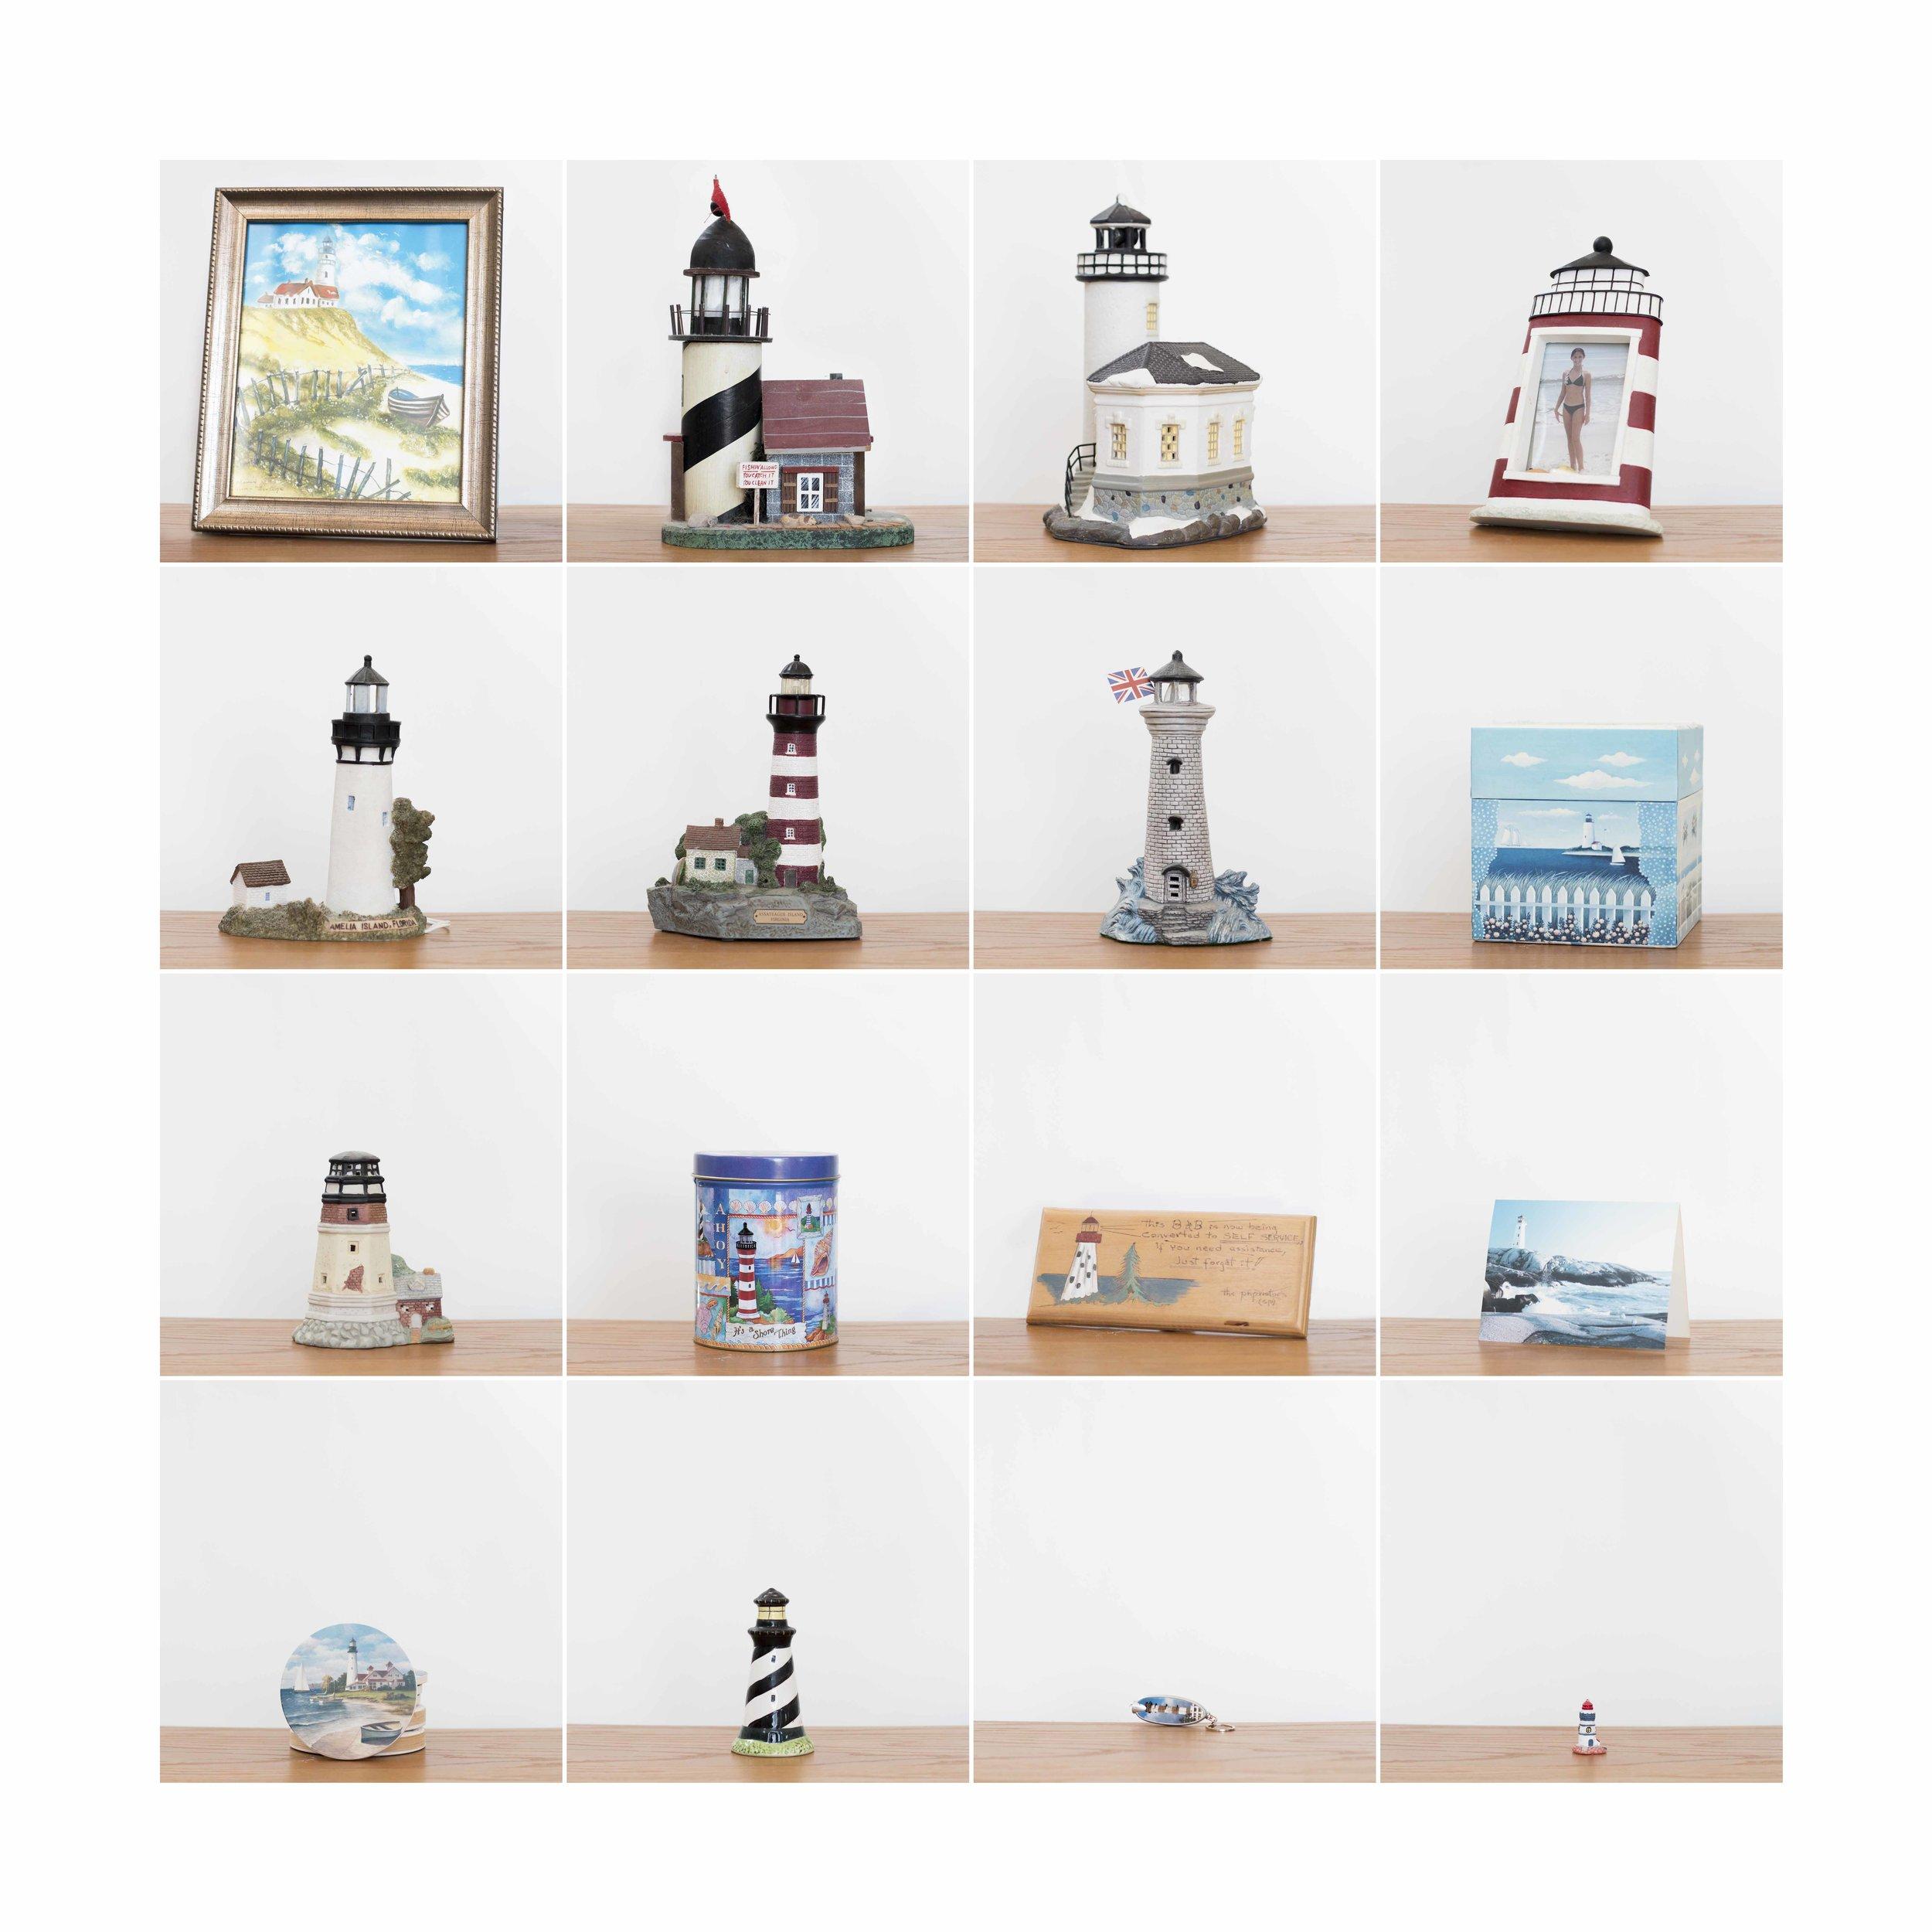 lighthousestoprint.jpg